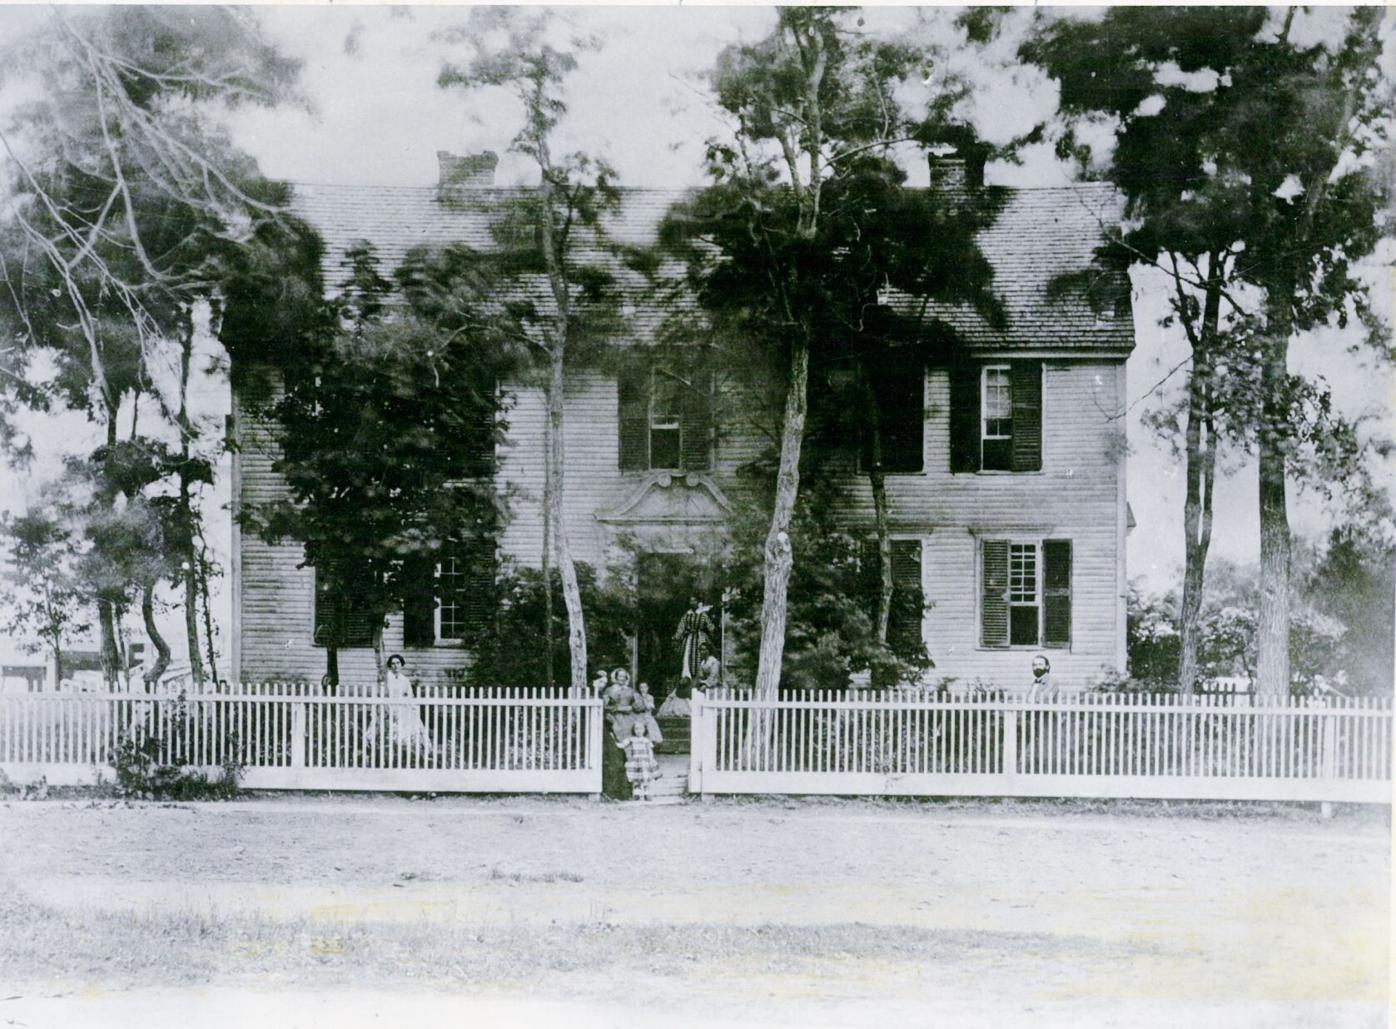 The home of the Rev. Thomas Allen